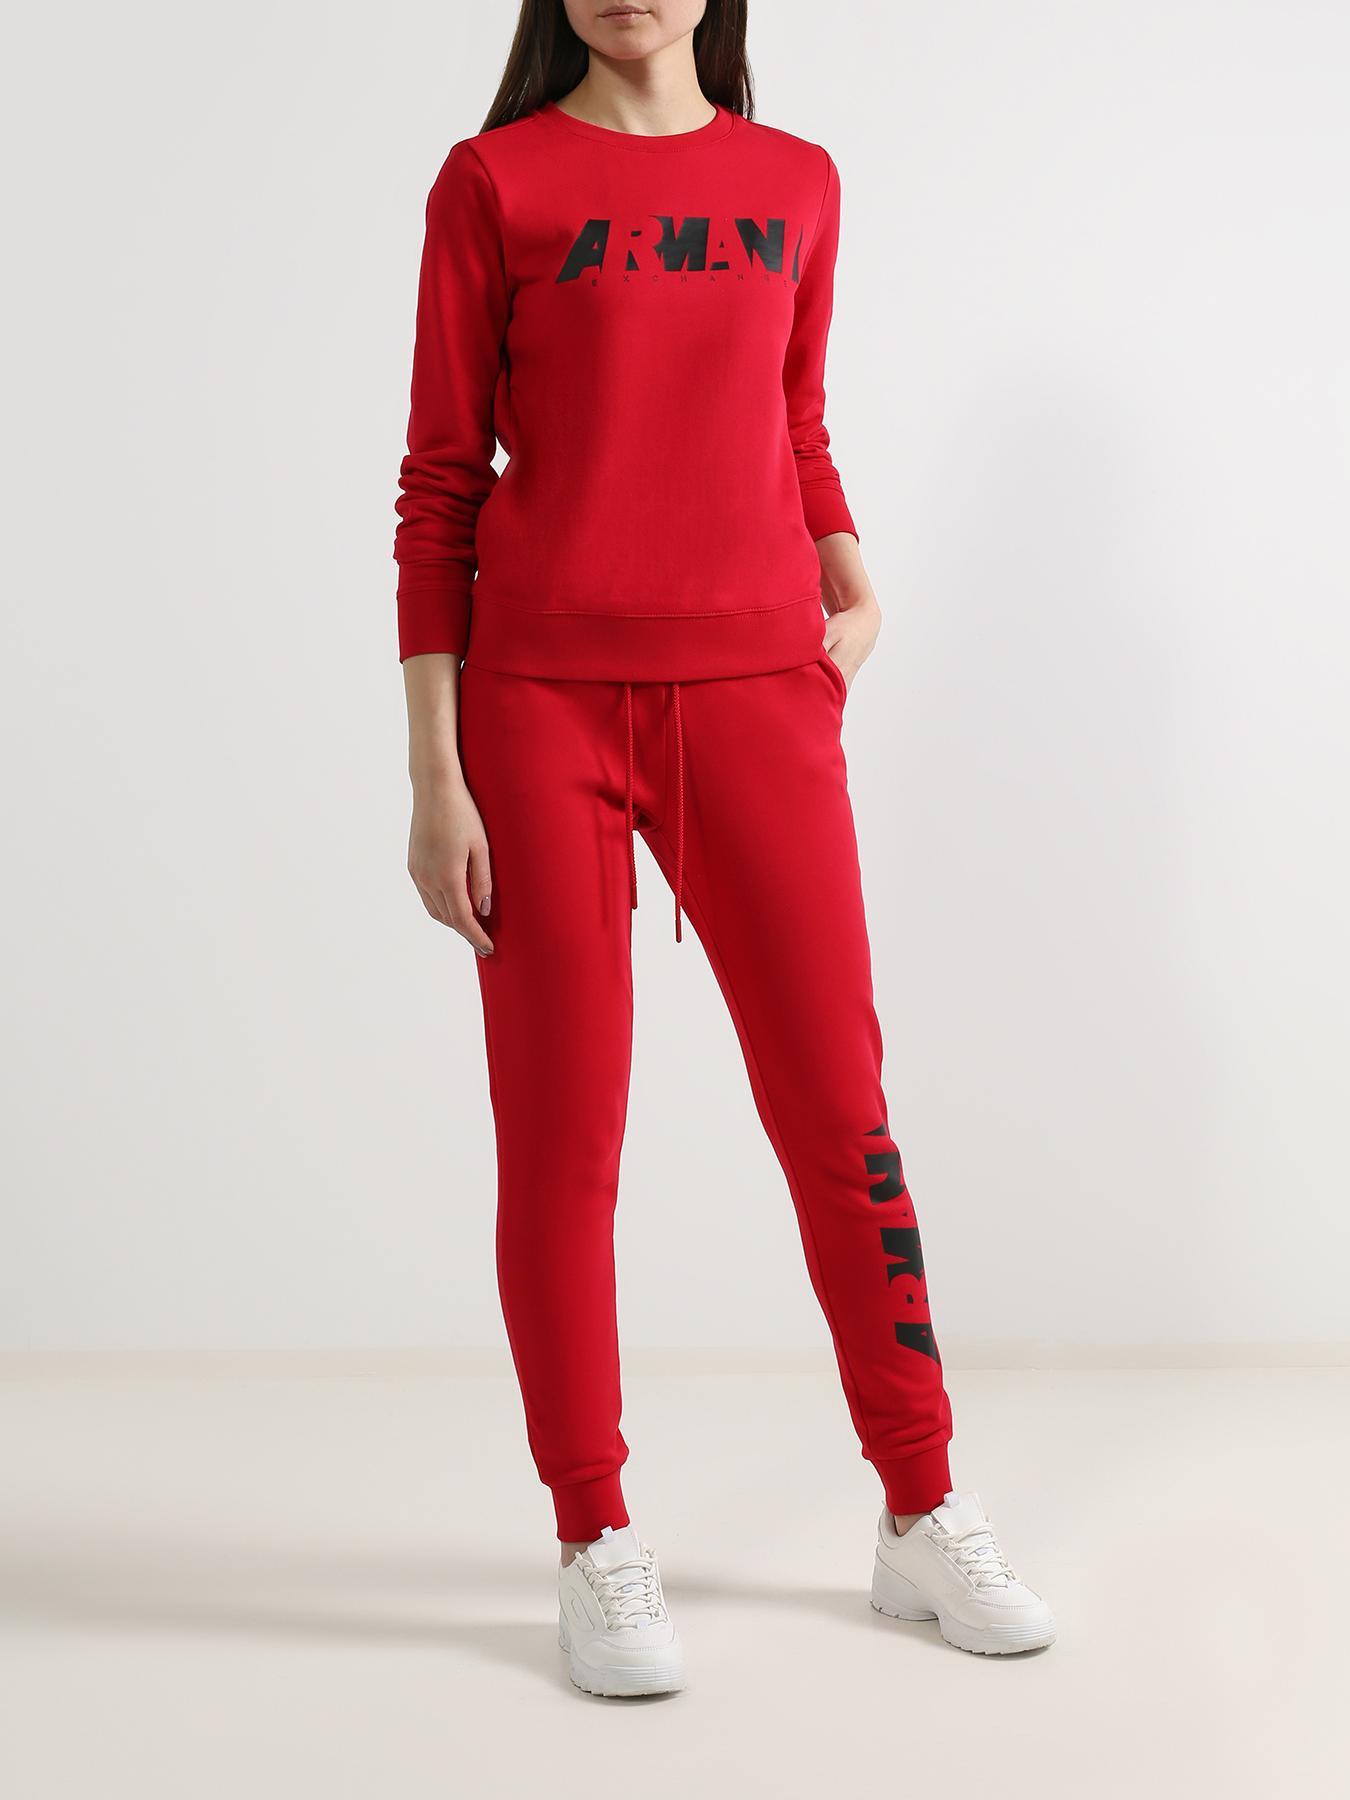 Брюки Armani Exchange Спортивные брюки брюки спортивные sugarlife sugarlife mp002xw0xjil